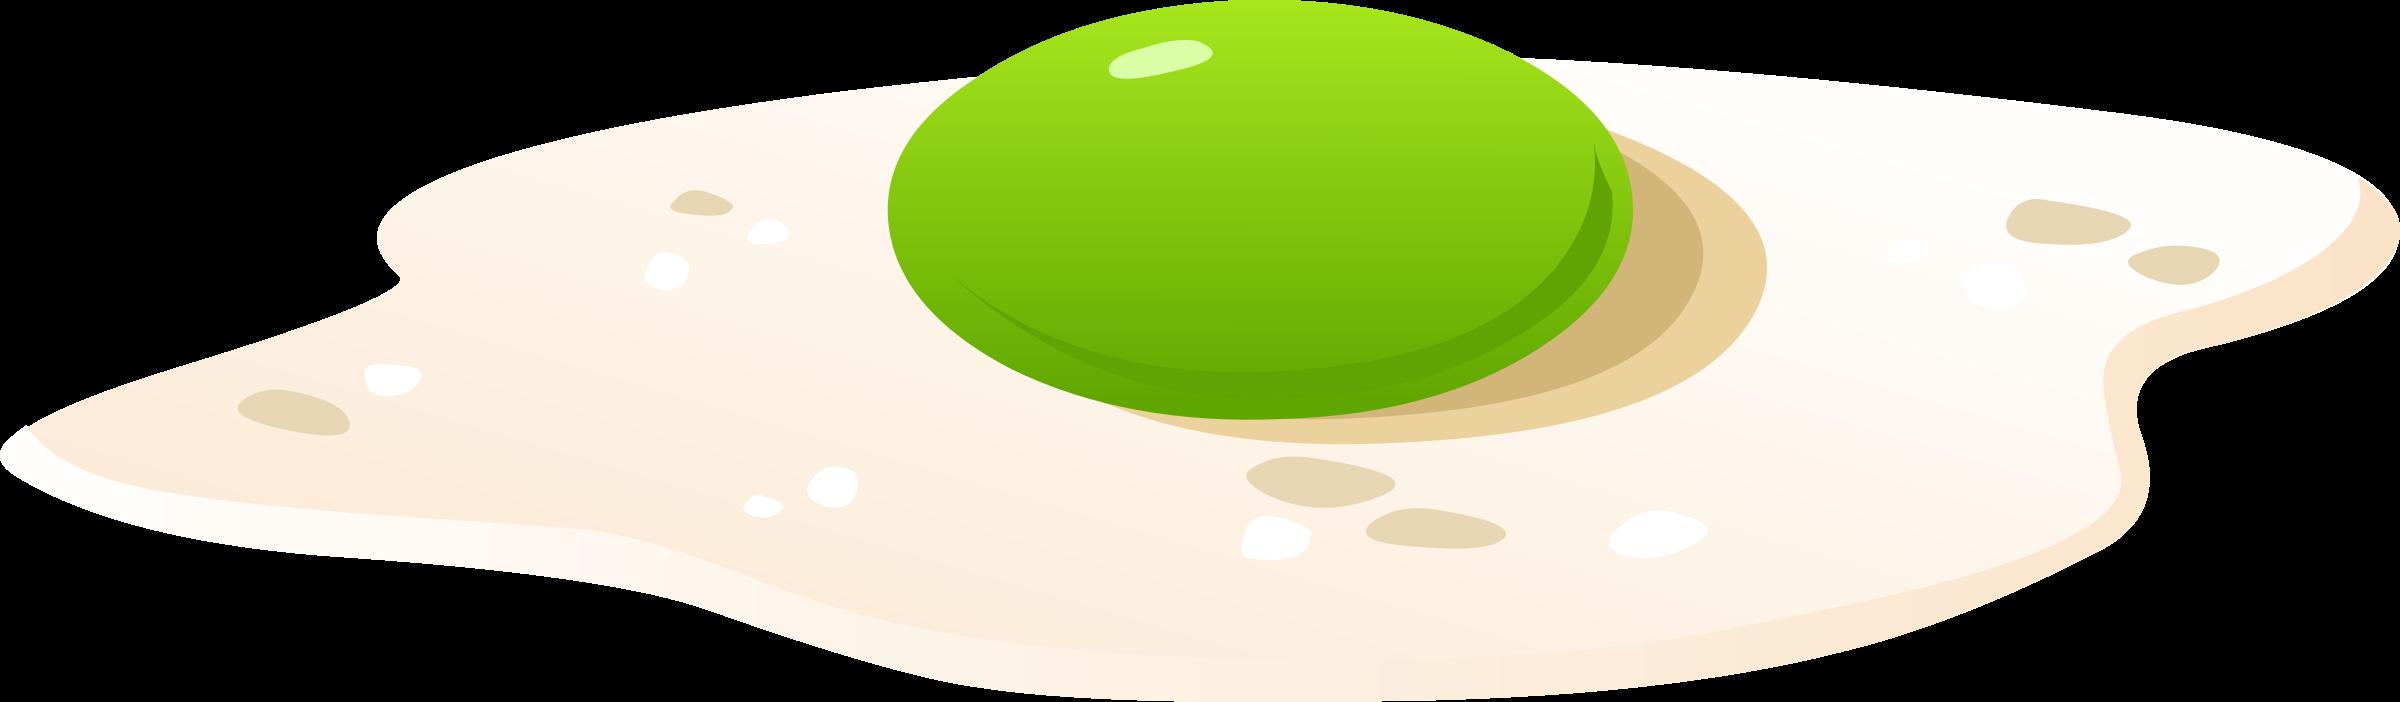 Green eggs big image. Circle clipart food